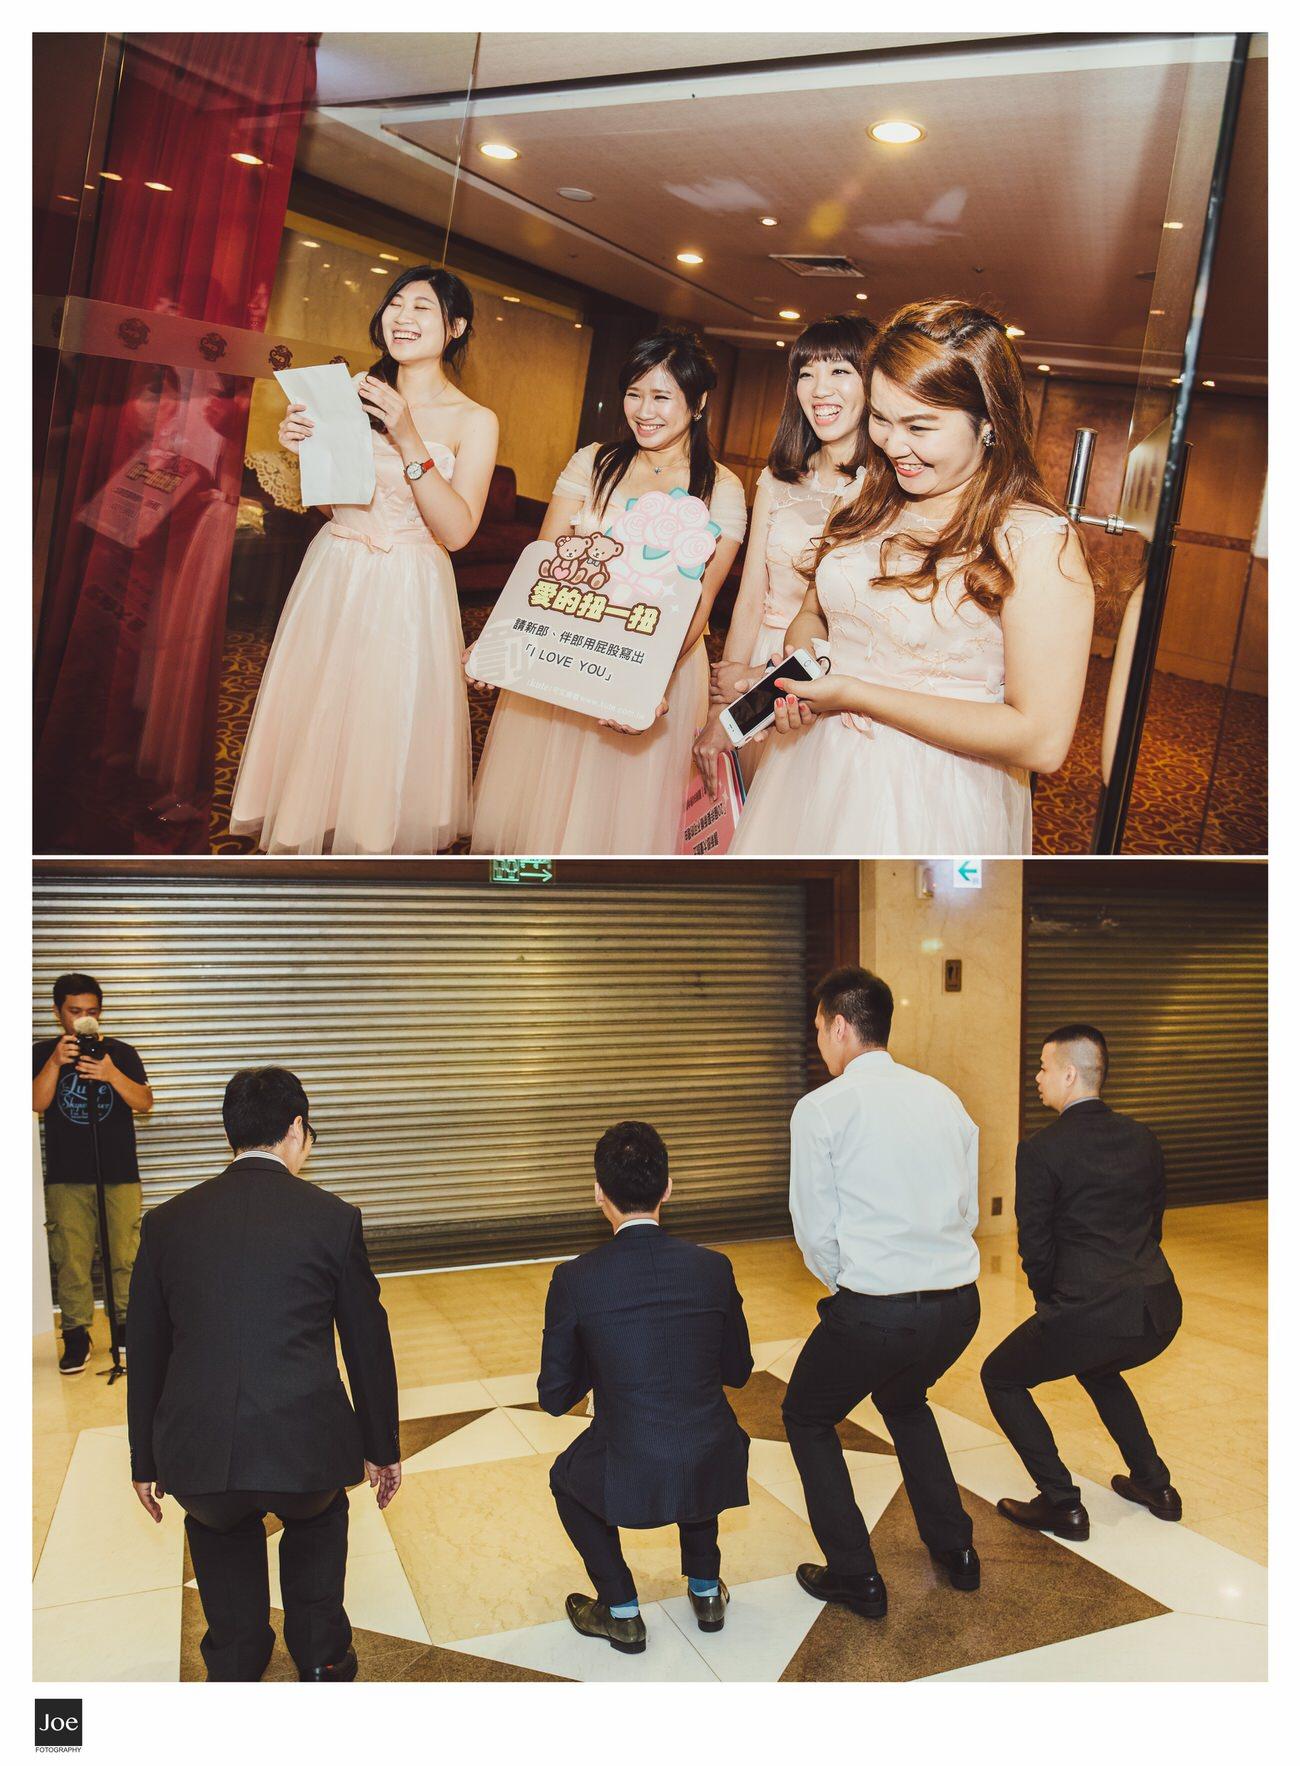 sunworld-dynasty-hotel-taipei-wedding-photo-joe-fotography-angel-jay-032.jpg